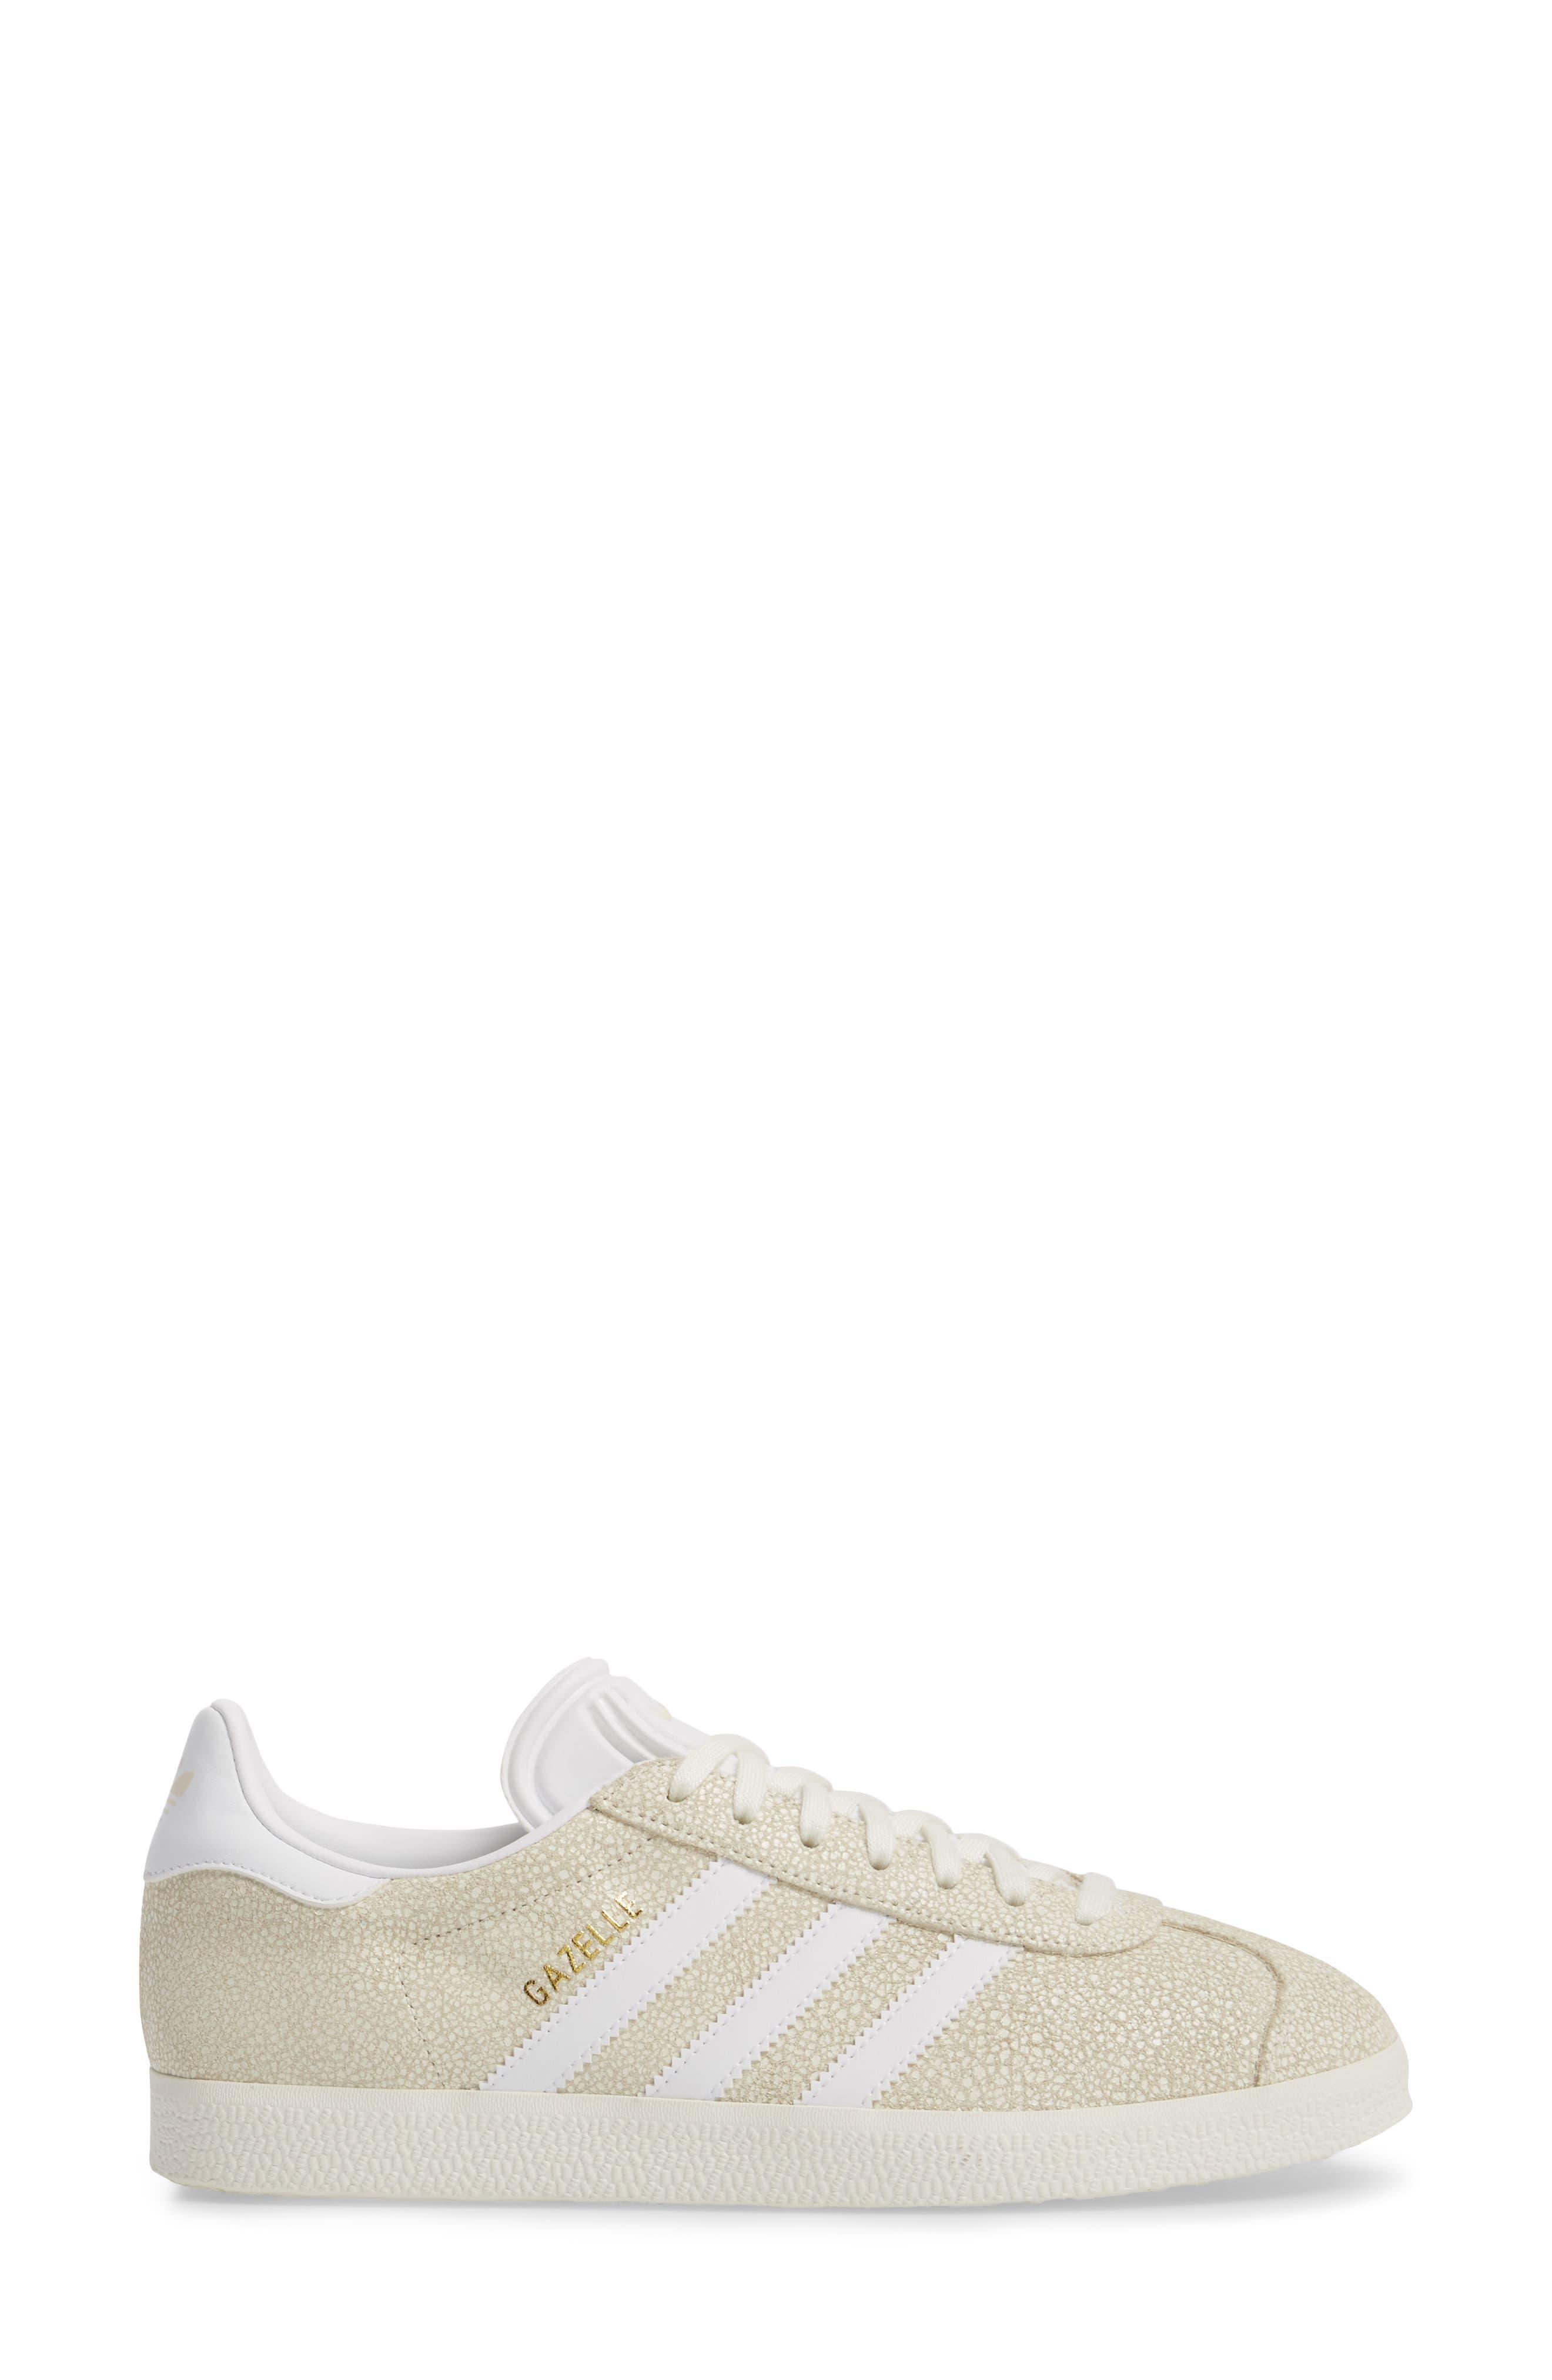 Gazelle Sneaker,                             Alternate thumbnail 3, color,                             OFF WHITE/ WHITE/ OFF WHITE